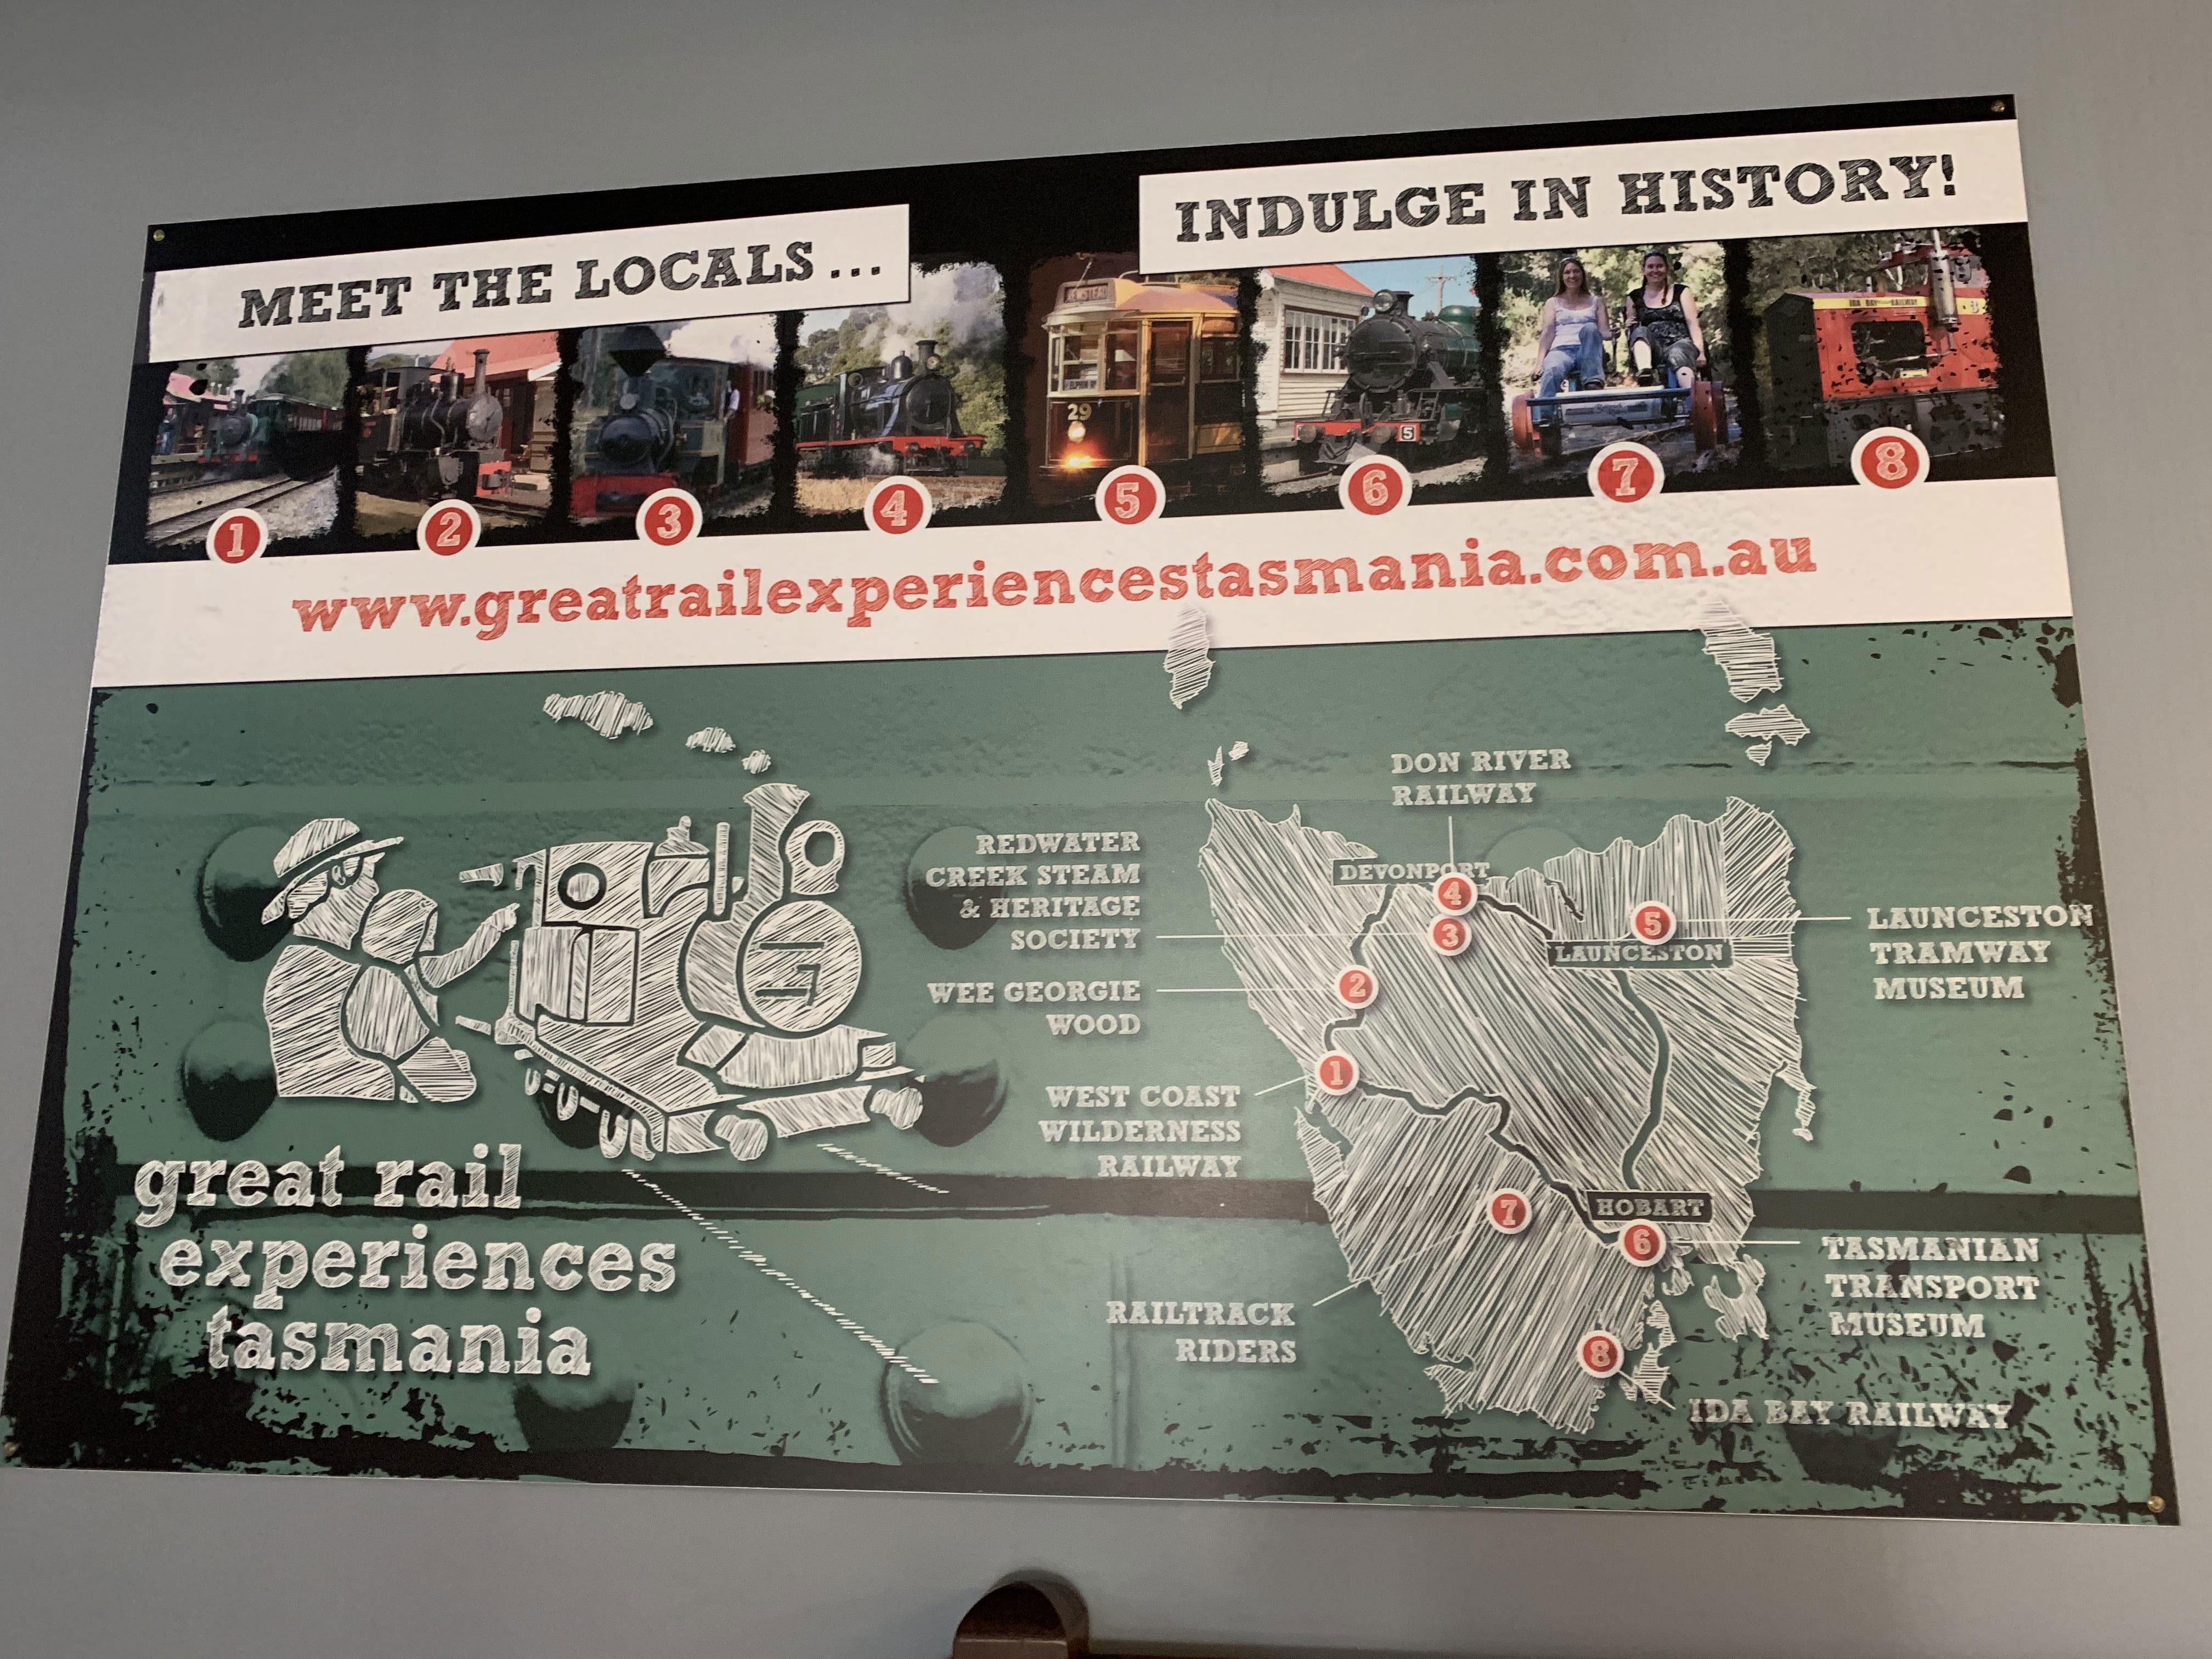 Map of railway museums in Tasmania, QVM, Launceston